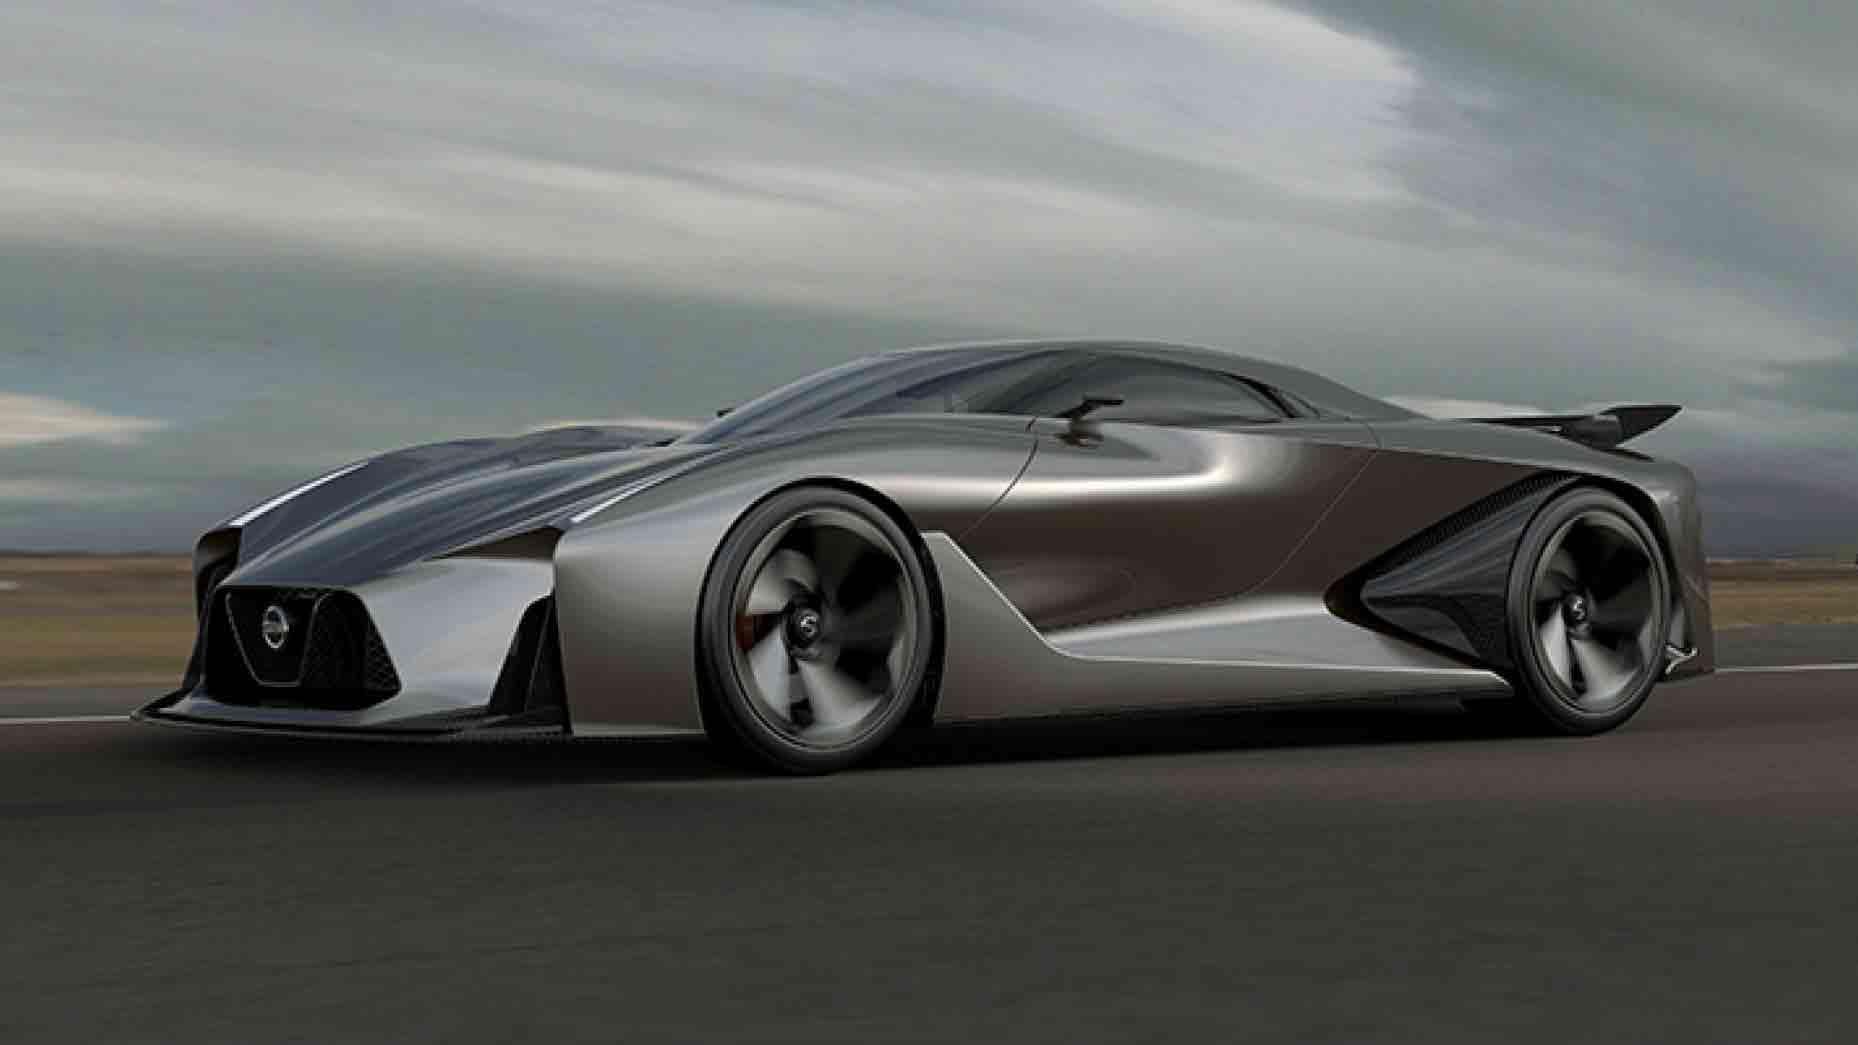 2018 nissan gtr concept. contemporary concept 2018 nissan gtr nissan gtr supercars in nissan gtr concept d